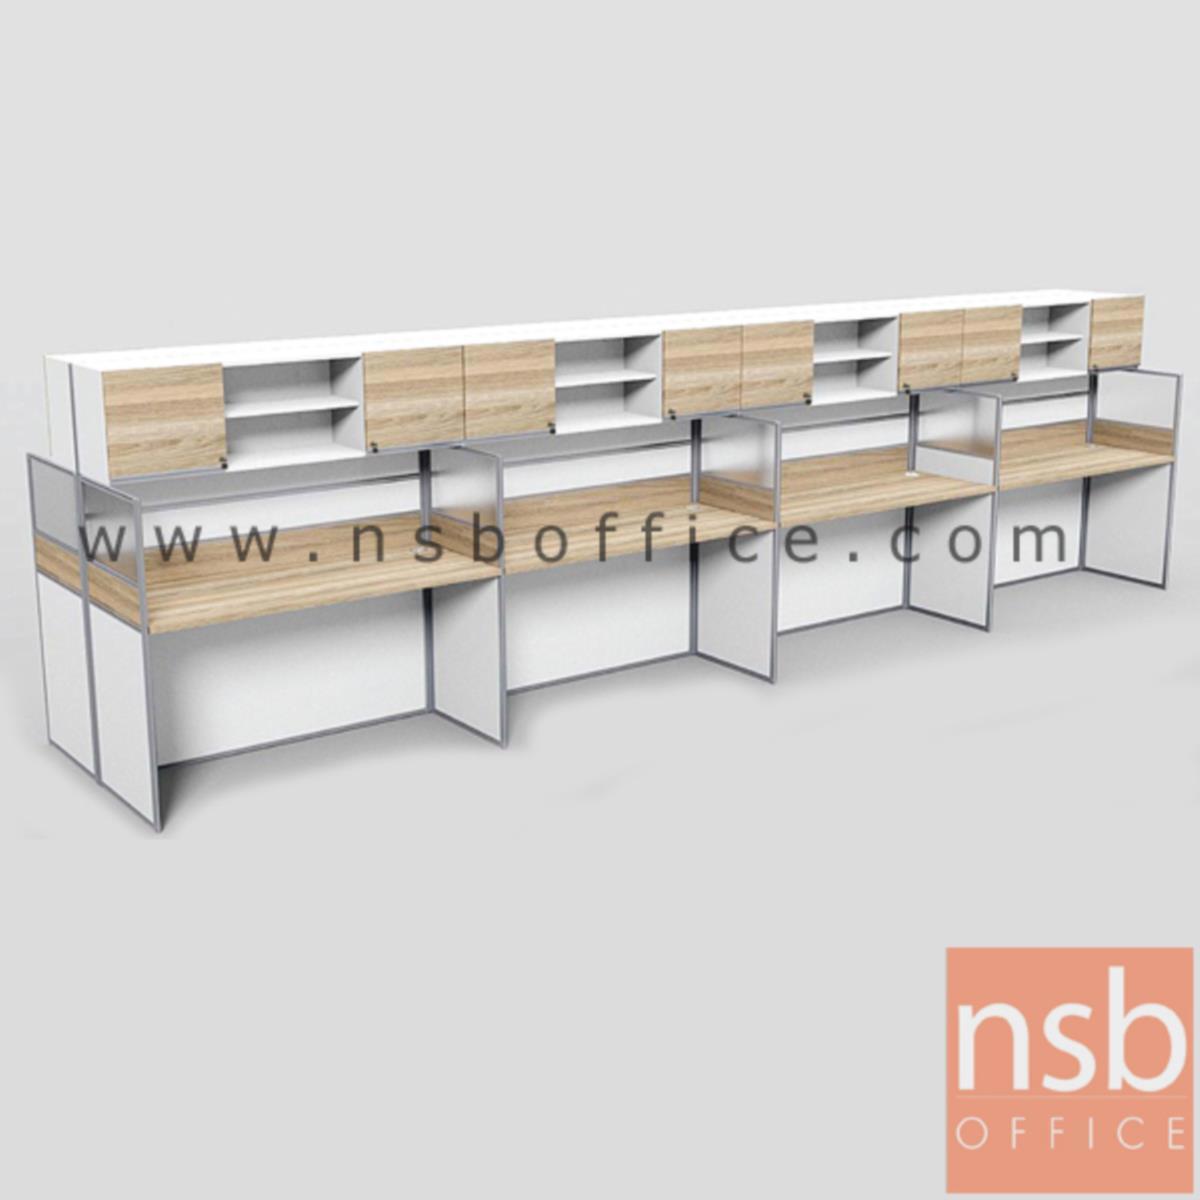 A04A197:ชุดโต๊ะทำงานกลุ่มหน้าตรง 8 ที่นั่ง รุ่น Barcadi 6 (บาร์คาดี้ 6) ขนาดรวม 490W ,610W cm. มีและไม่มีตู้แขวนเอกสาร